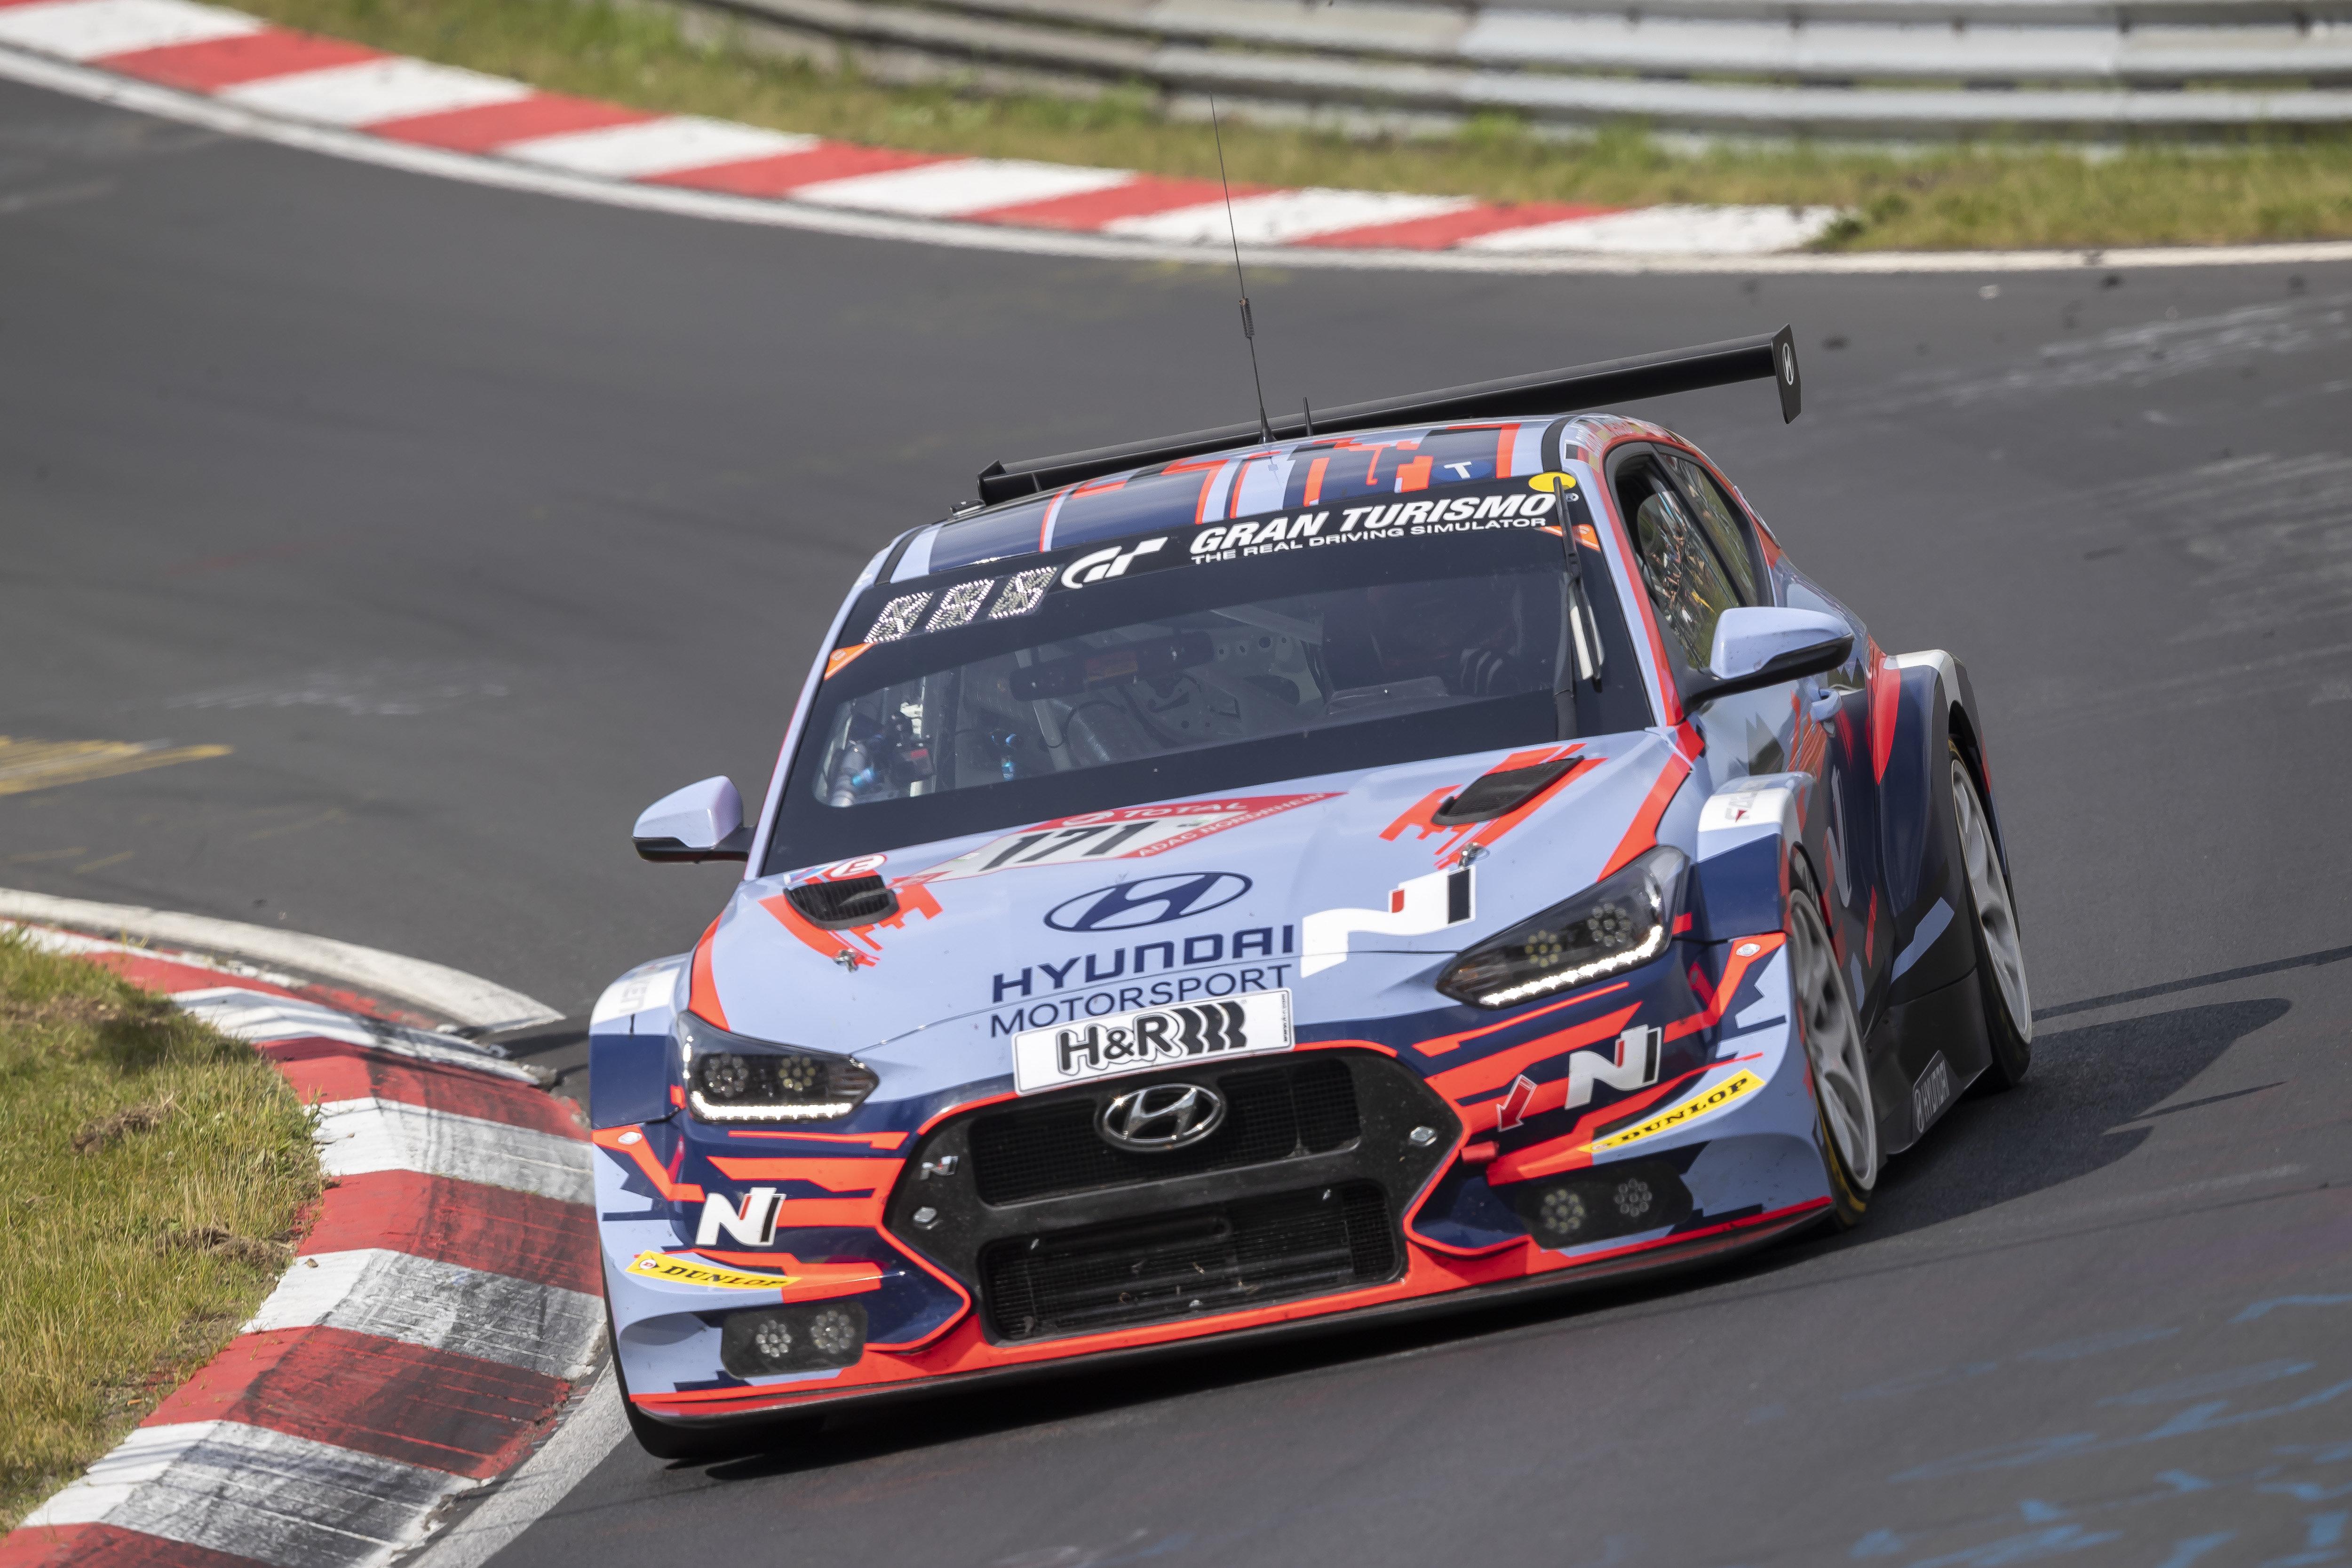 Veloster N TCR - Nürburgring 24 Hours